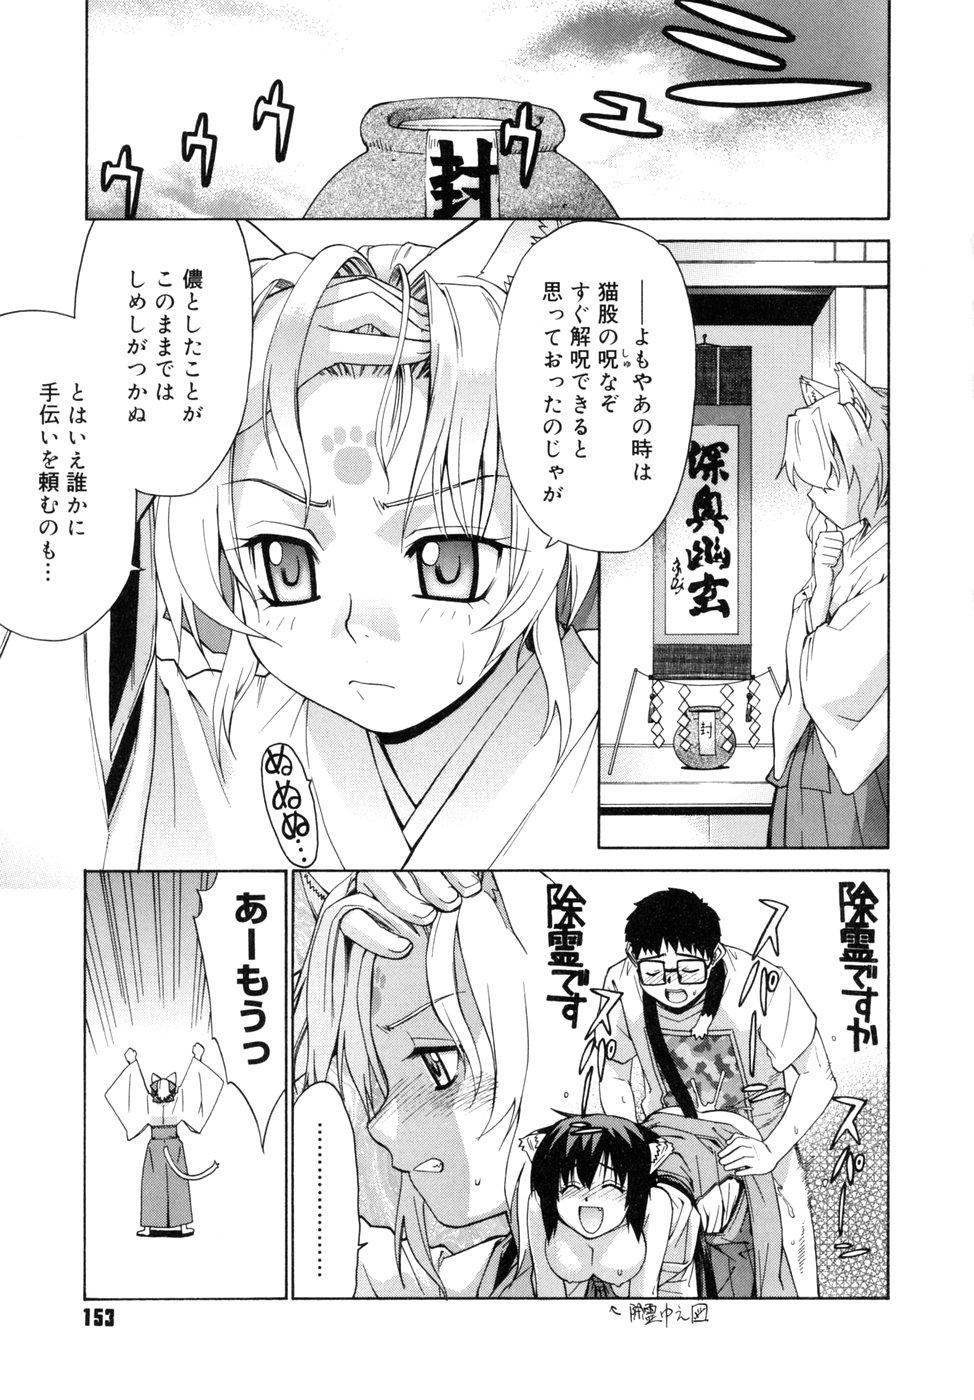 [Yaya Hinata] Tonari no Miko-san wa Minna Warau - The next shrine maidens smile in everyone. 152